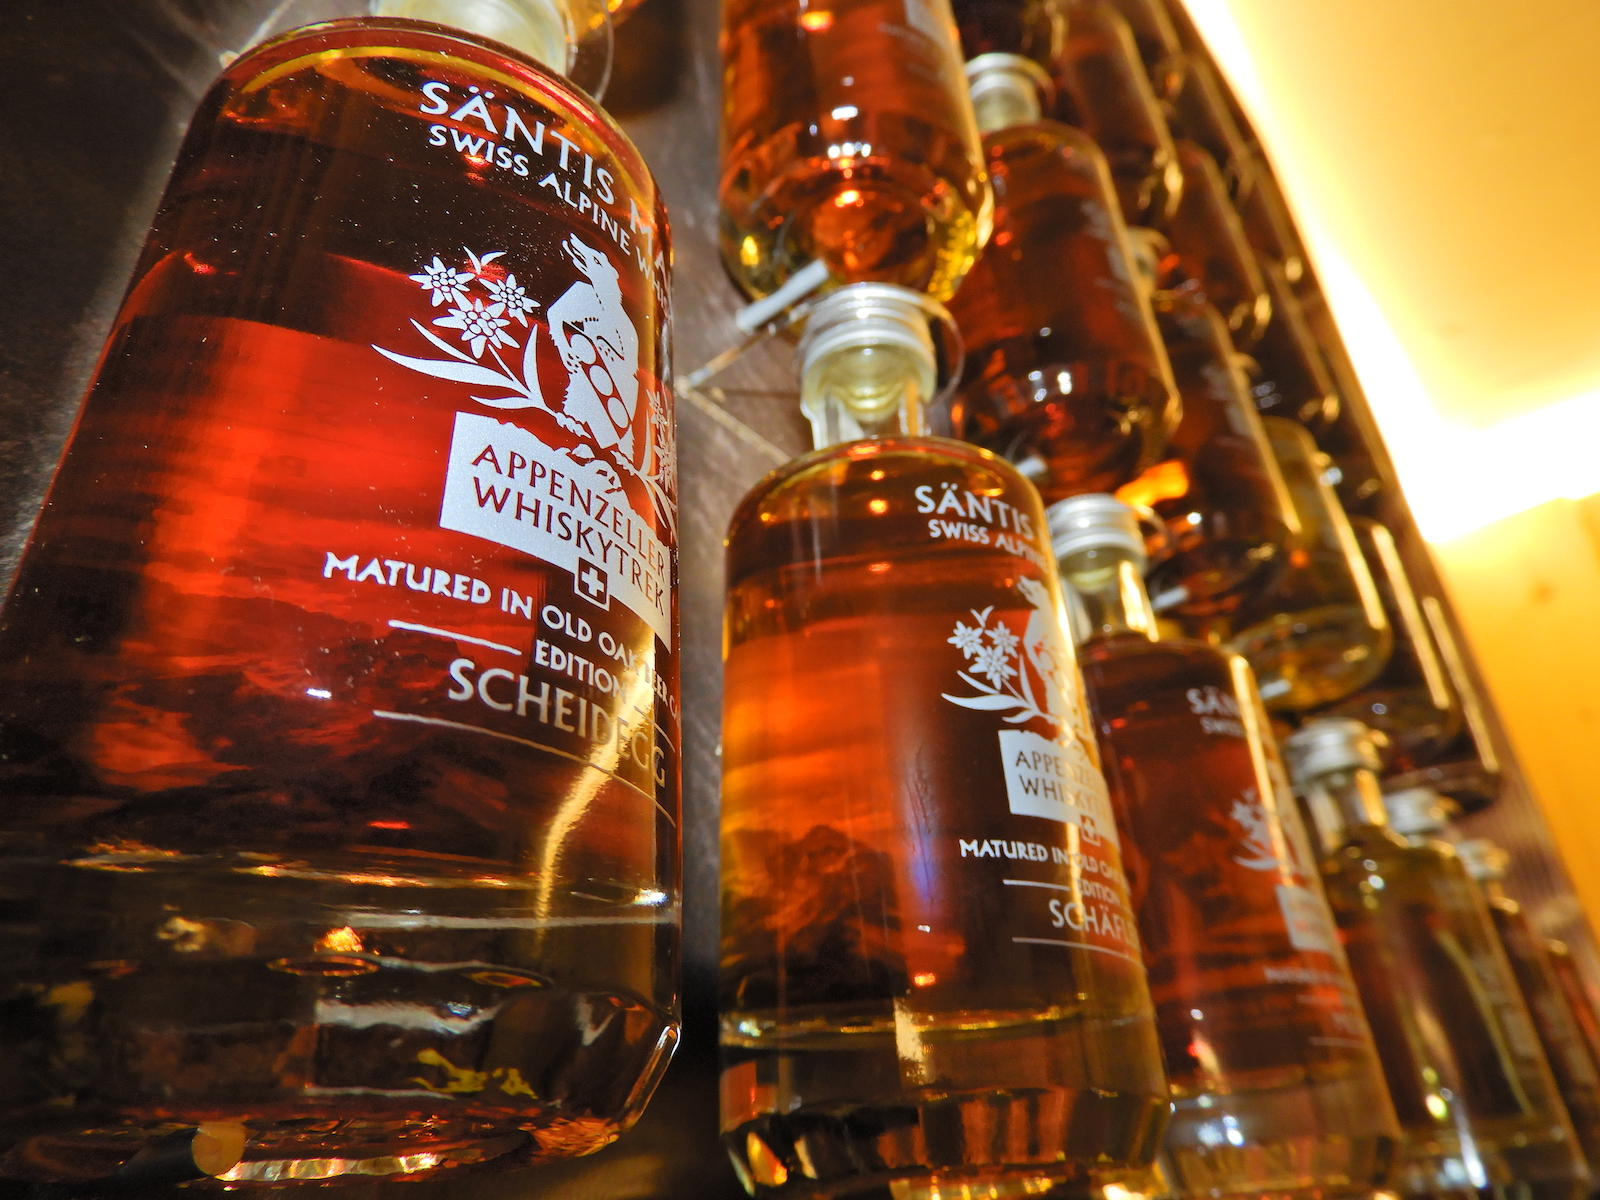 Whiskytrek Säntis Malt